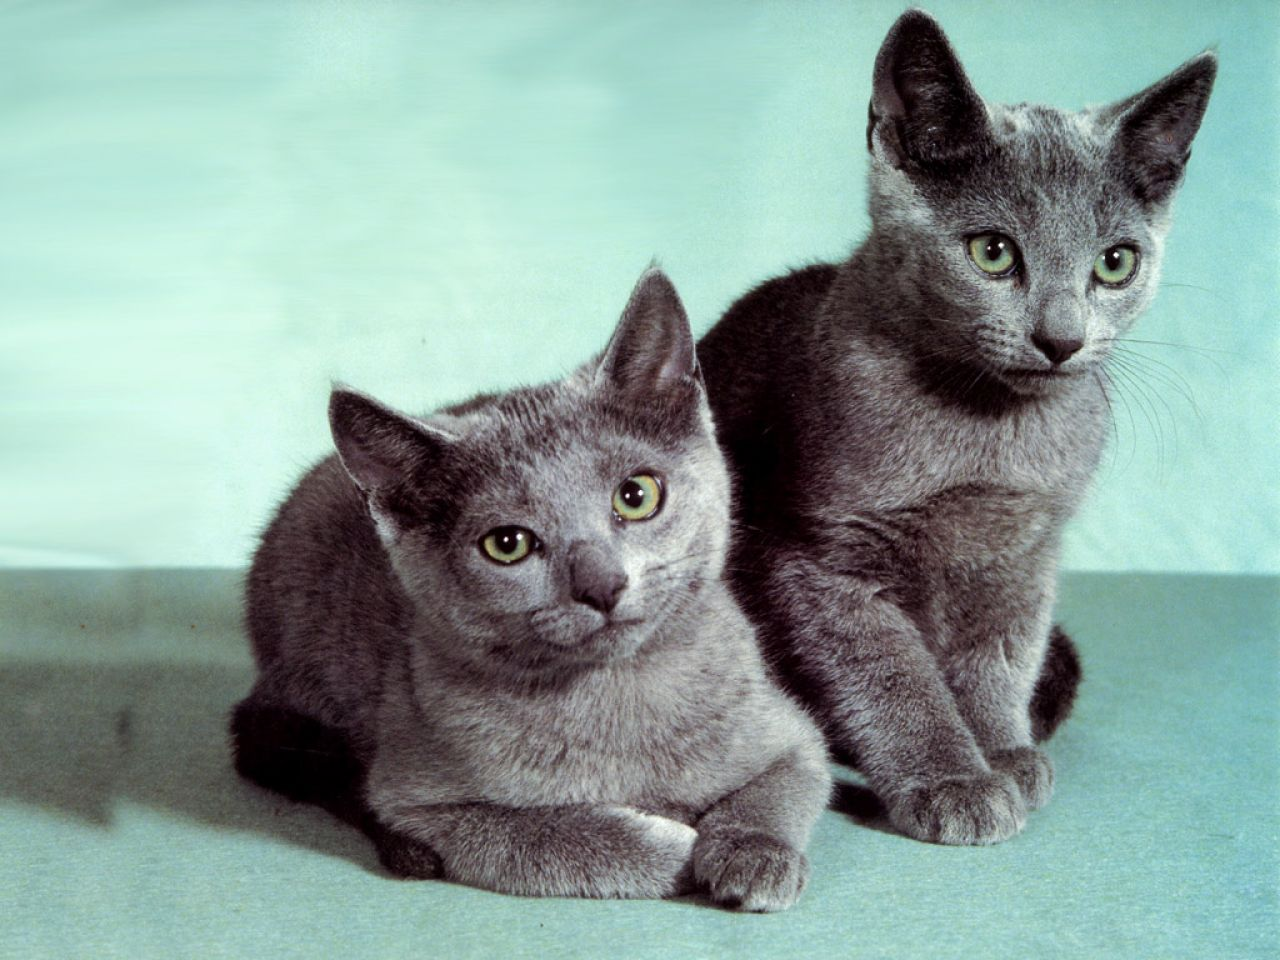 cats desktop wallpaper Animals wallpapers 1280x960